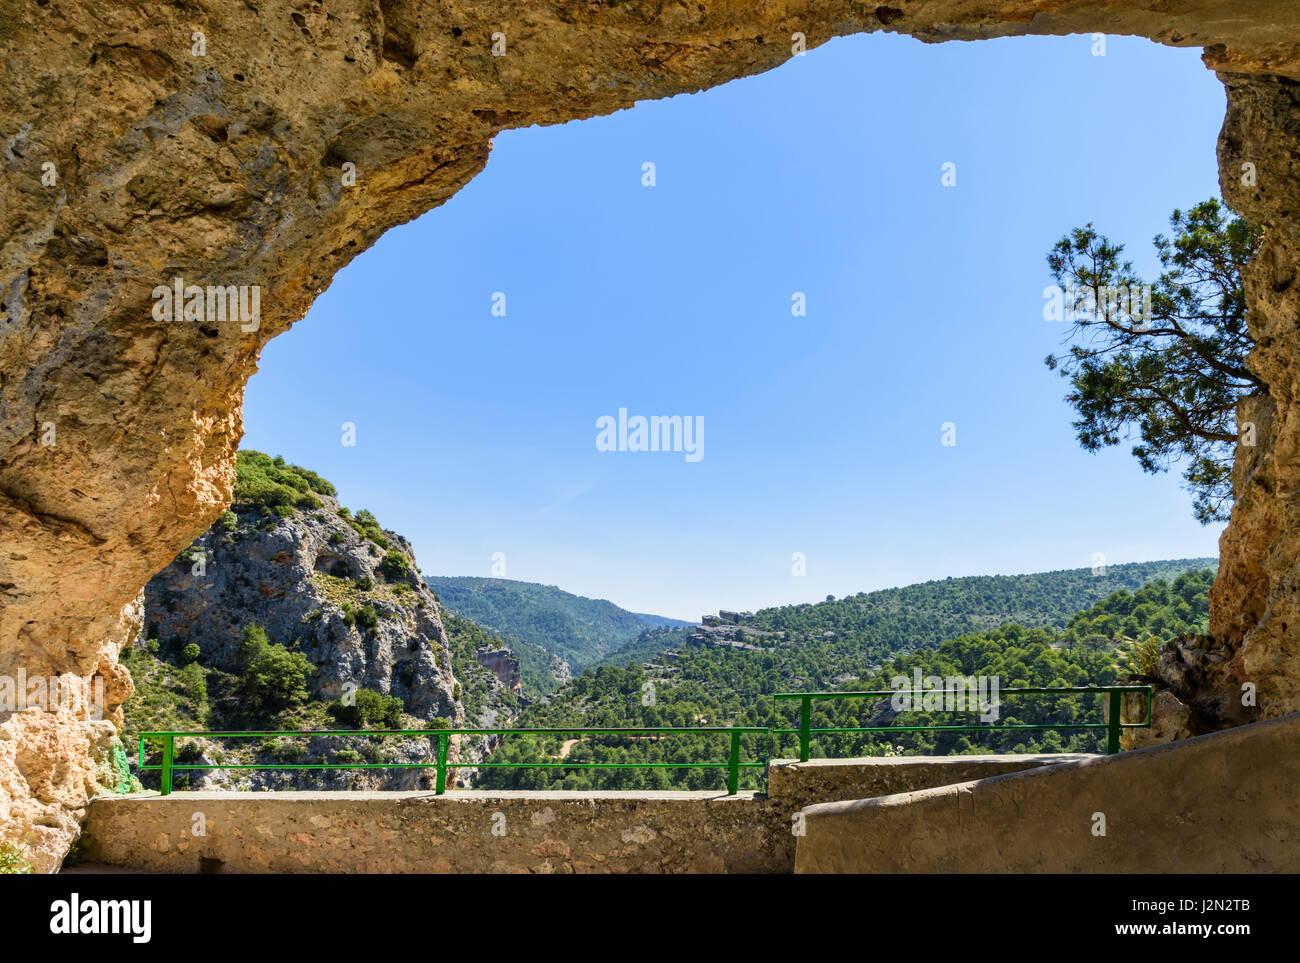 Framed views over the Jucar Gorge through the open cave called The Ventano del Diablo, Castilla La Mancha, Spain - Stock Image